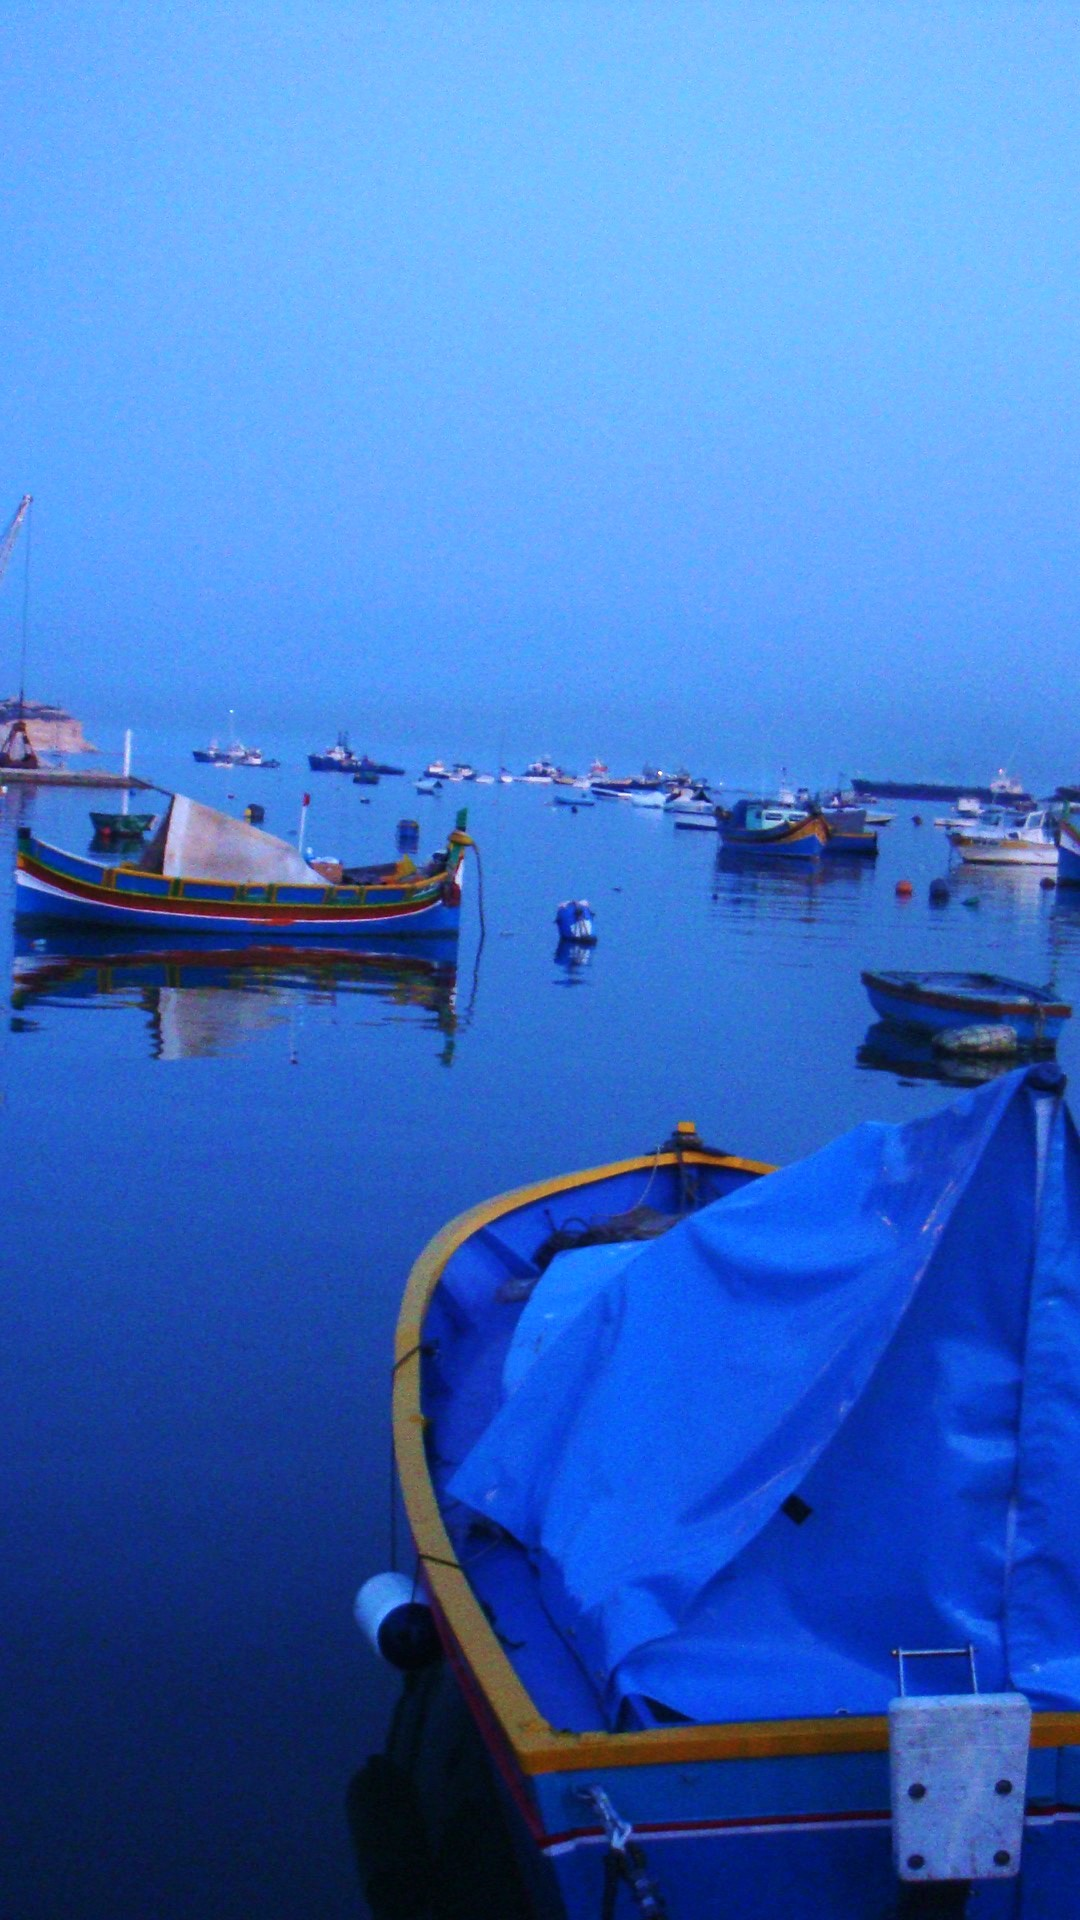 Boat Dock Sunset iPhone 6 Plus HD Wallpaper